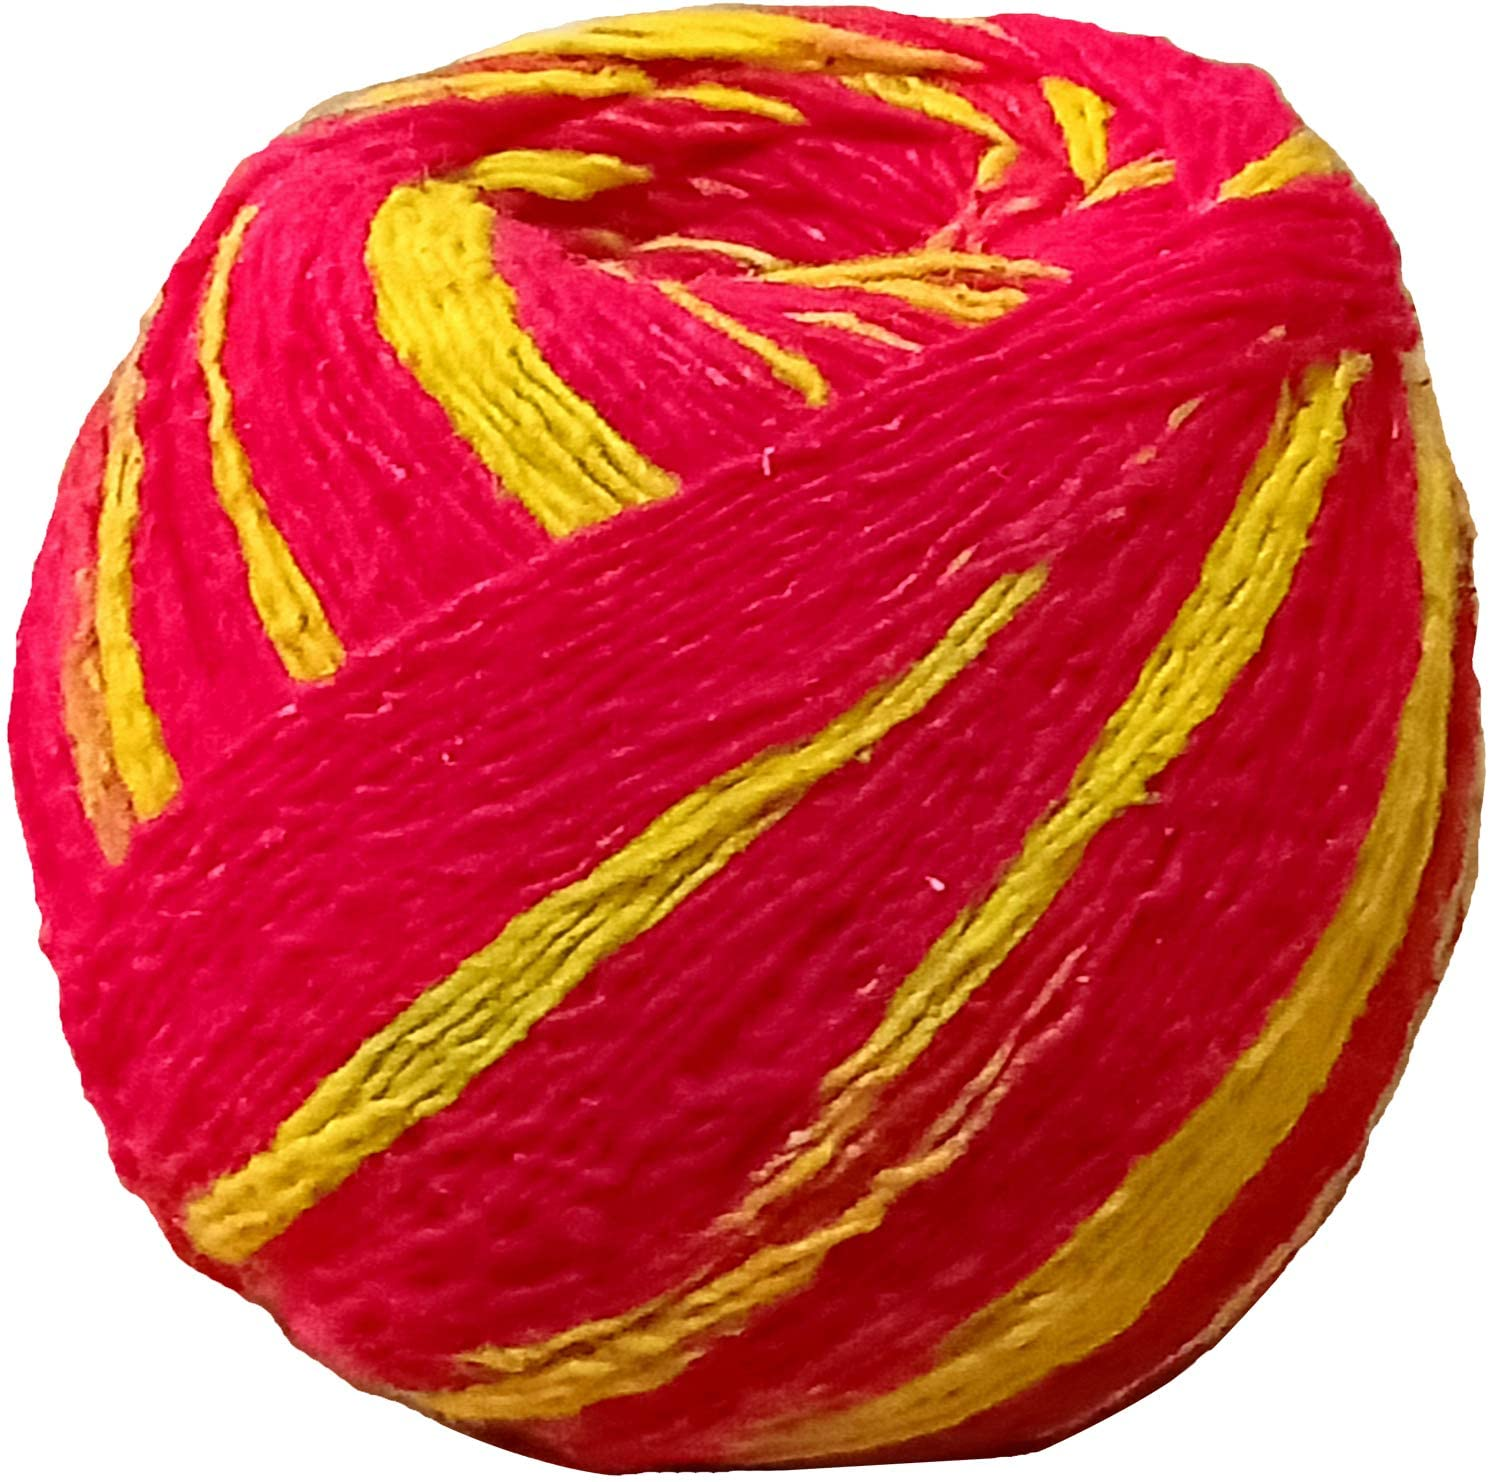 Handmade Mauli, Kalawa, Sacred Moli, Religious Cotton Thread, Pooja Dhaaga, Wrist Roll, Laccha, Pure Raksha Sutra, Rakhi, Organic Mouli Dhaga for Pujan, Havan, Worship, Diwali, Festival, Premium Quali